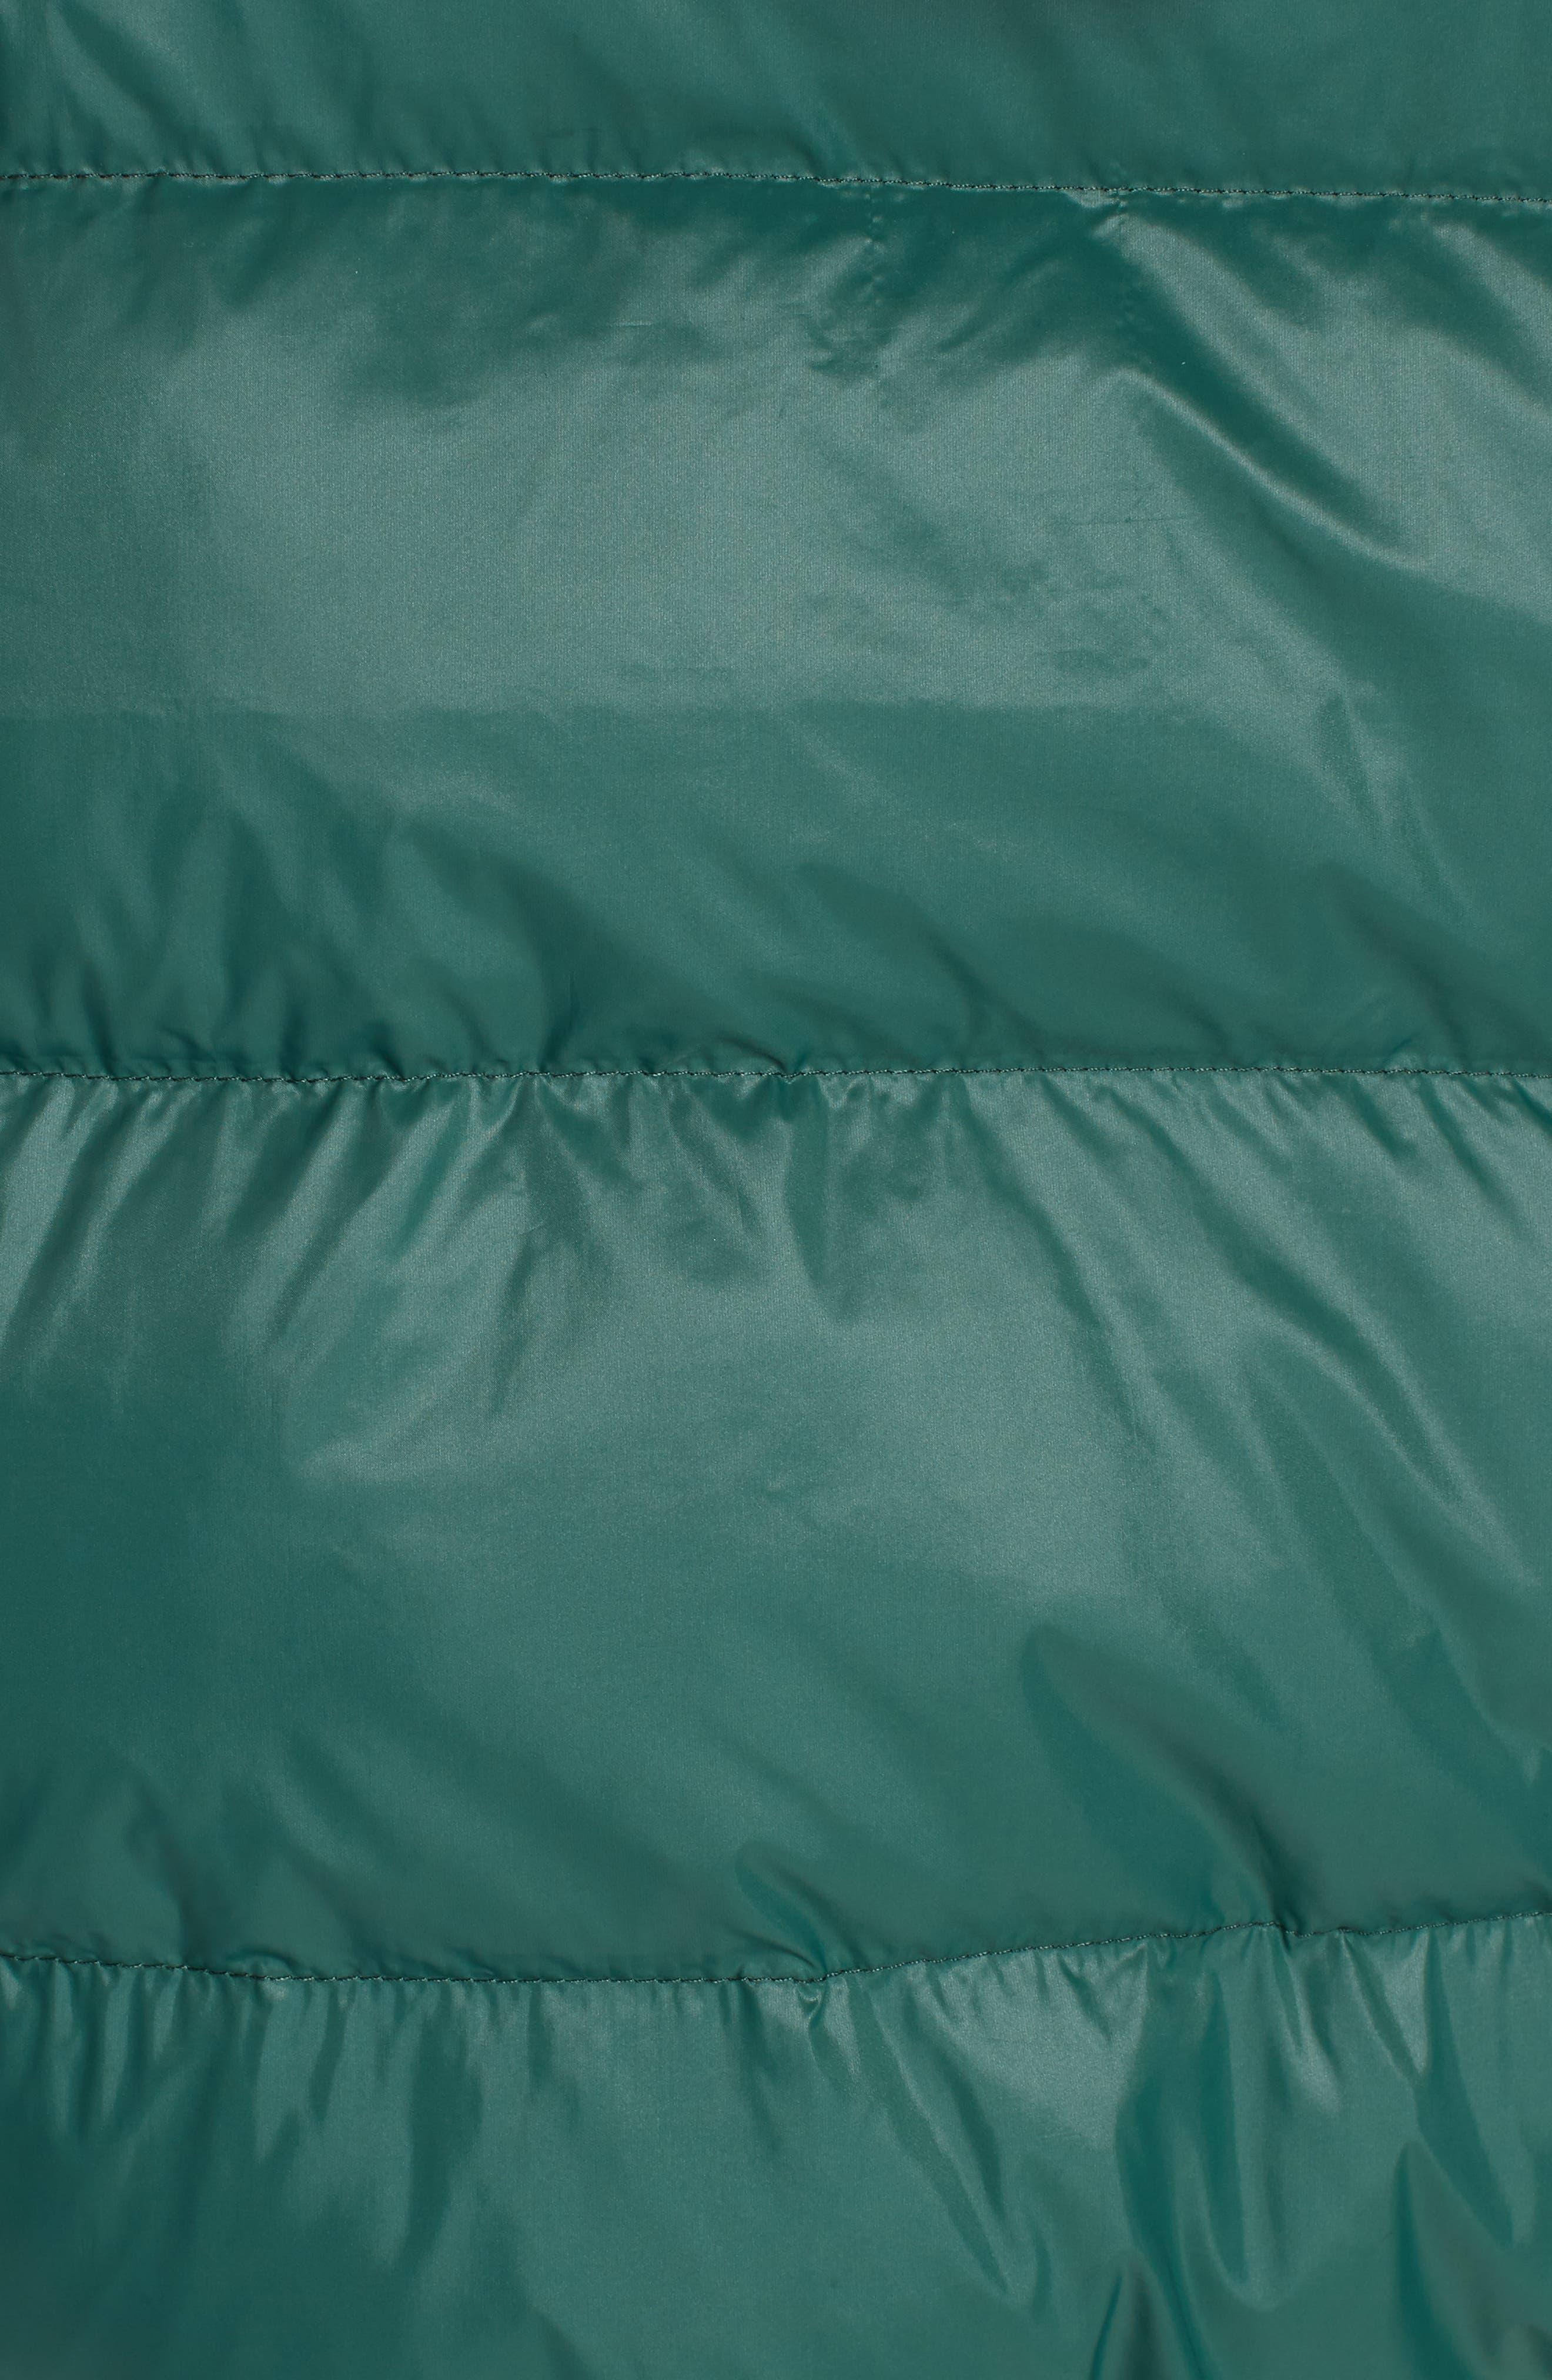 PROENZA SCHOULER, PSWL Reversible Puffer Coat, Alternate thumbnail 8, color, GREEN/ BLACK